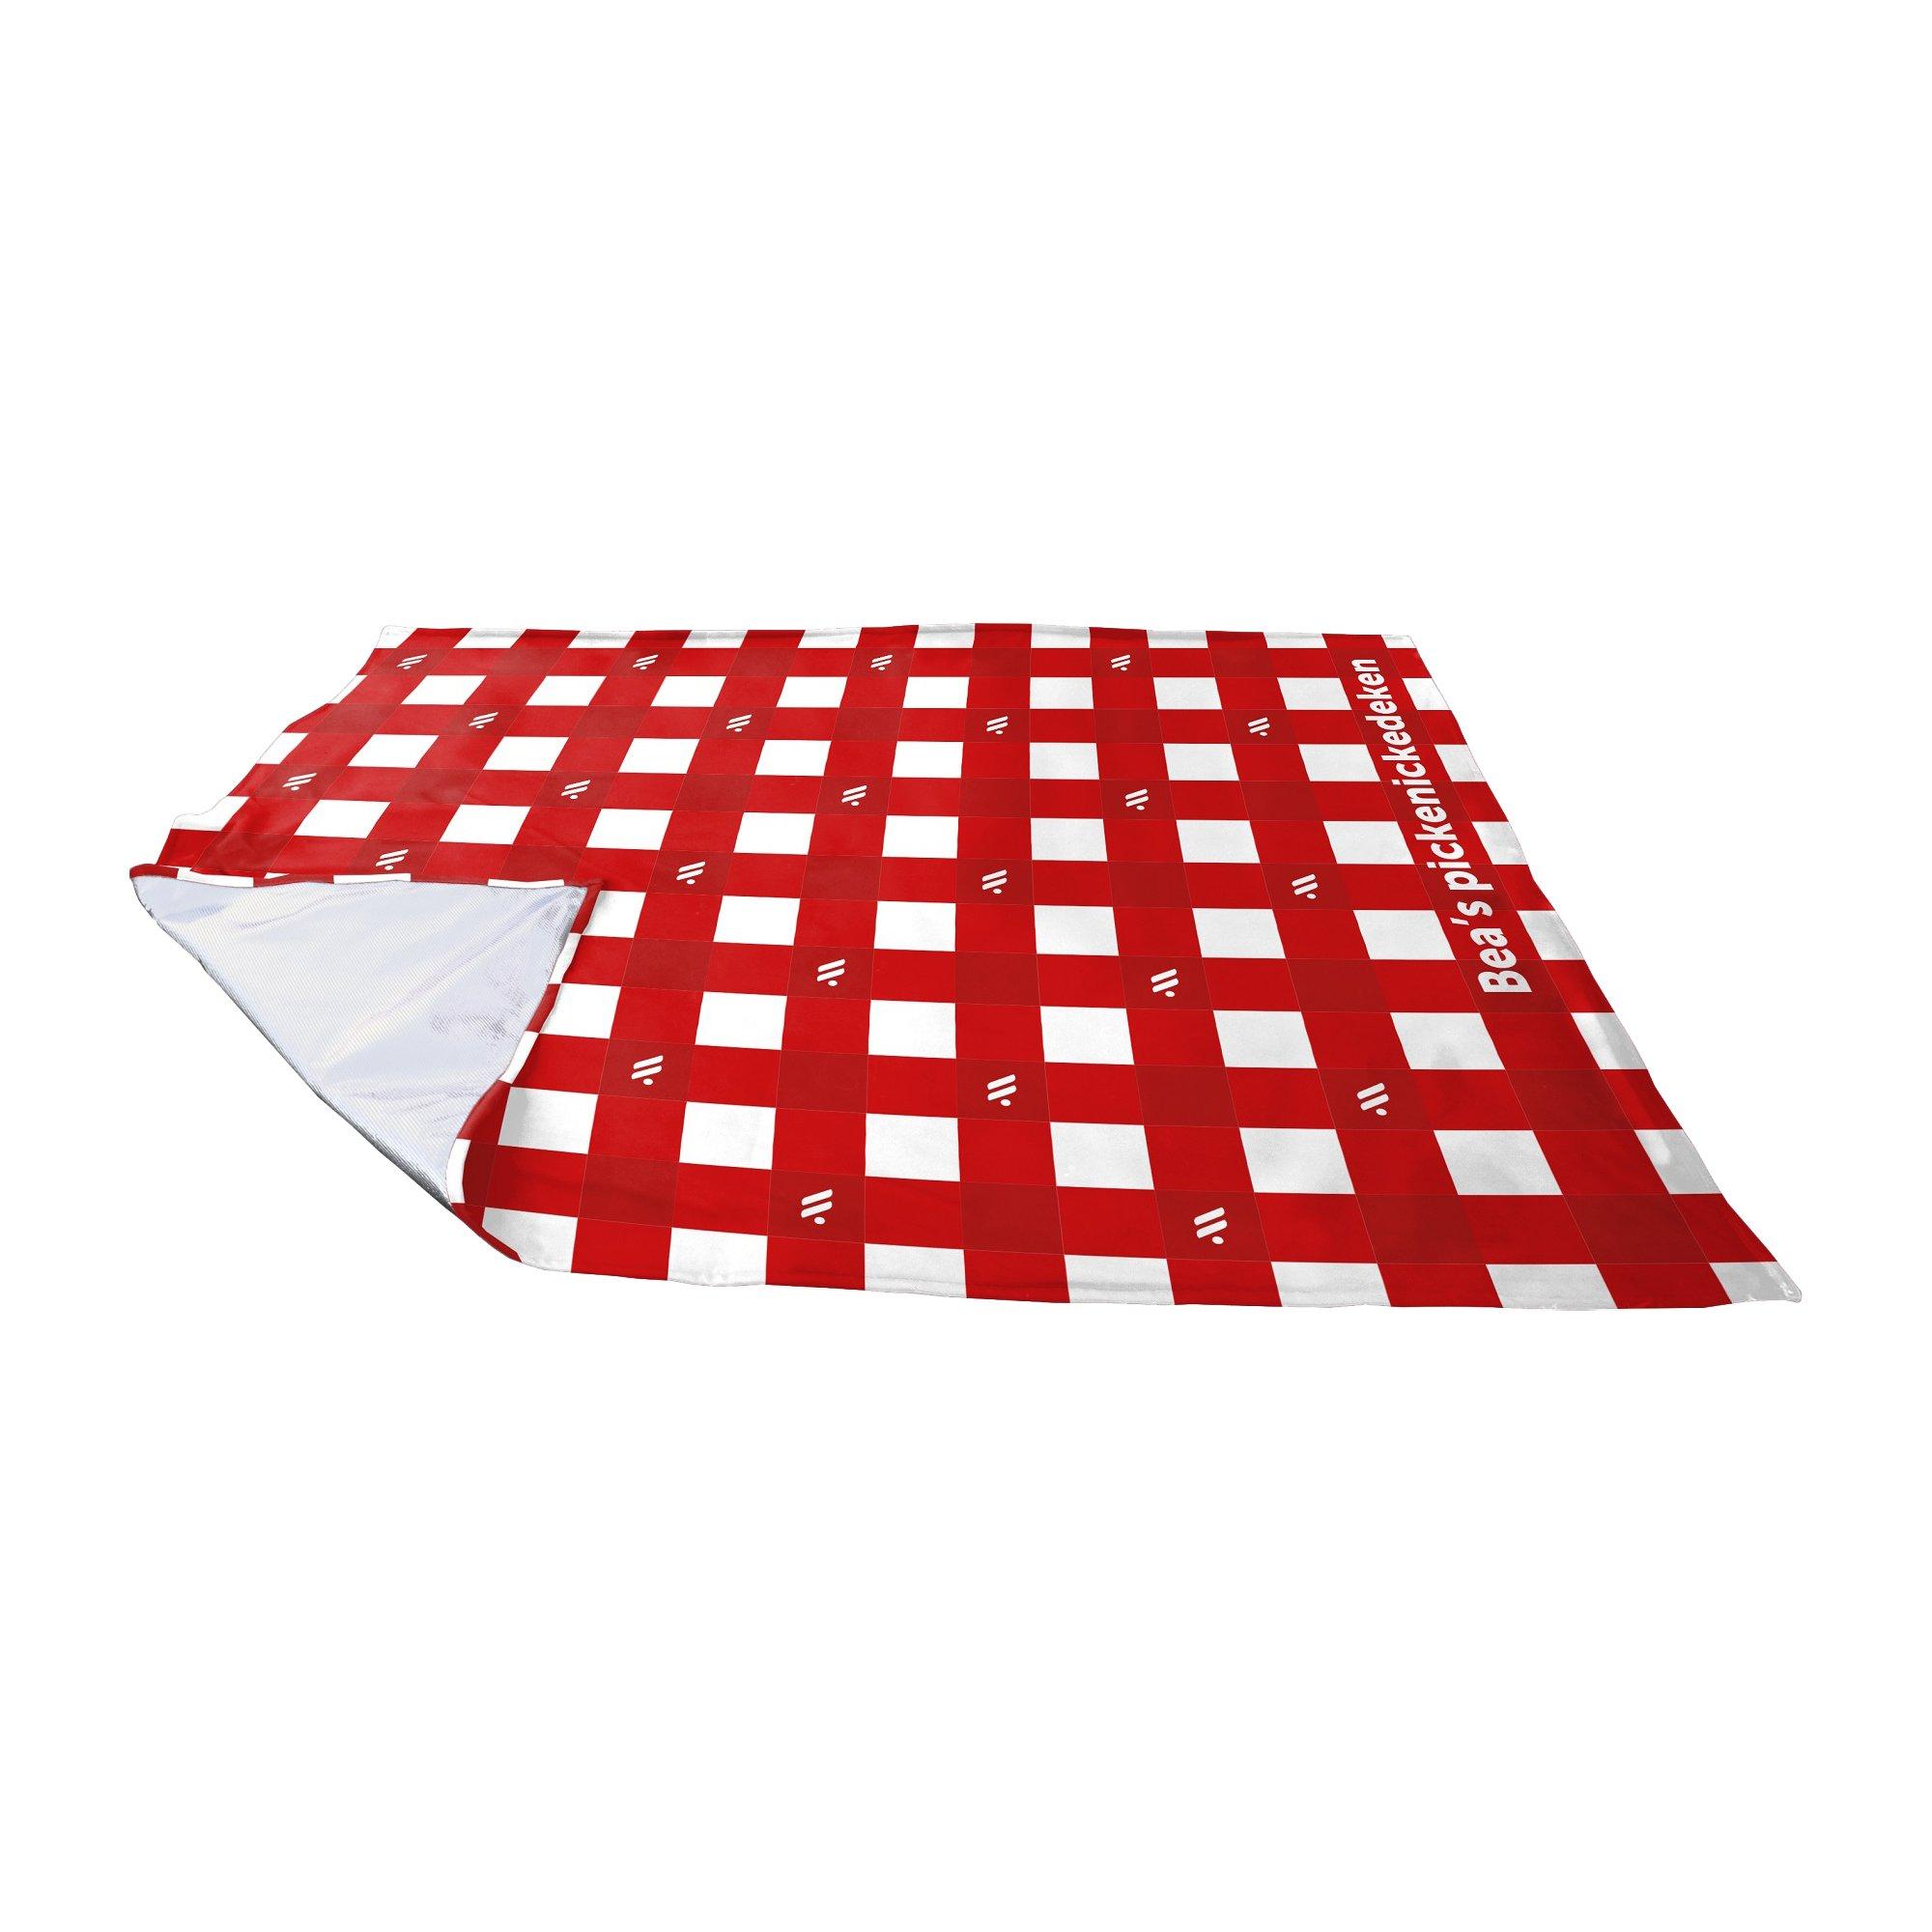 Leza small picnic blanket, printed all-over